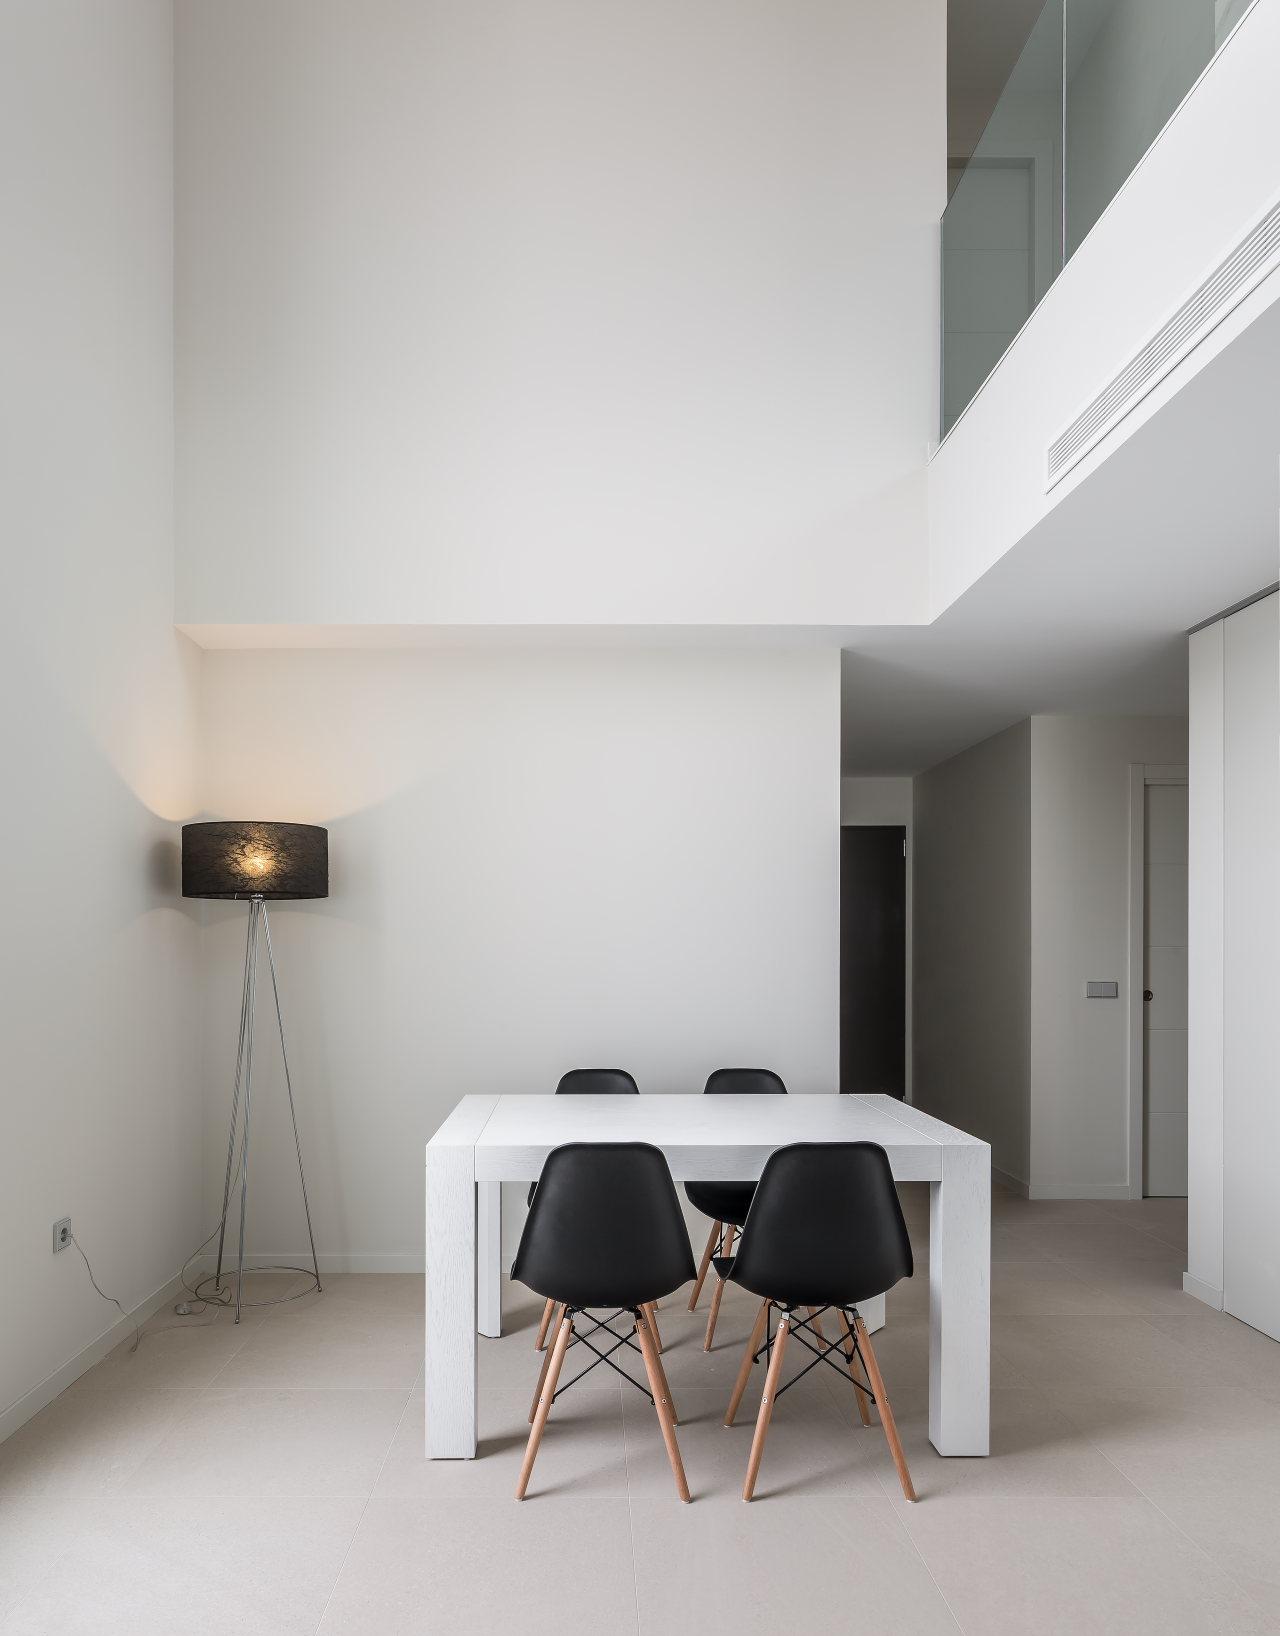 fotografia-arquitectura-valencia-german-cabo-viraje-san-antonio (19)